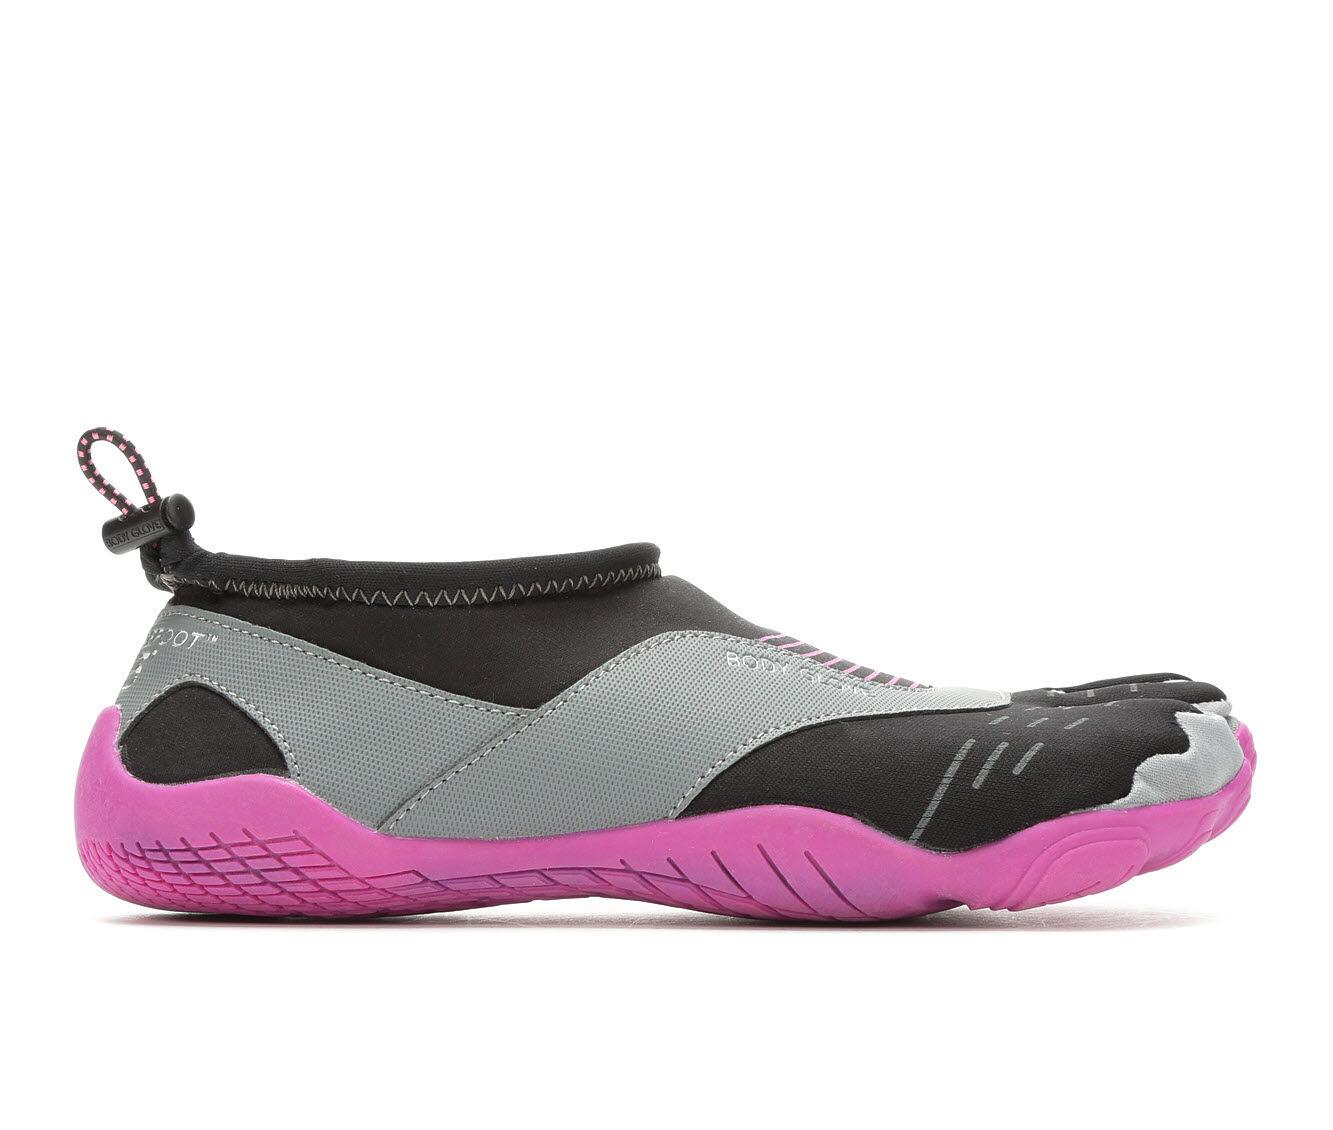 Women's Body Glove Barefoot Cinch Water Shoes Black/Flamingo